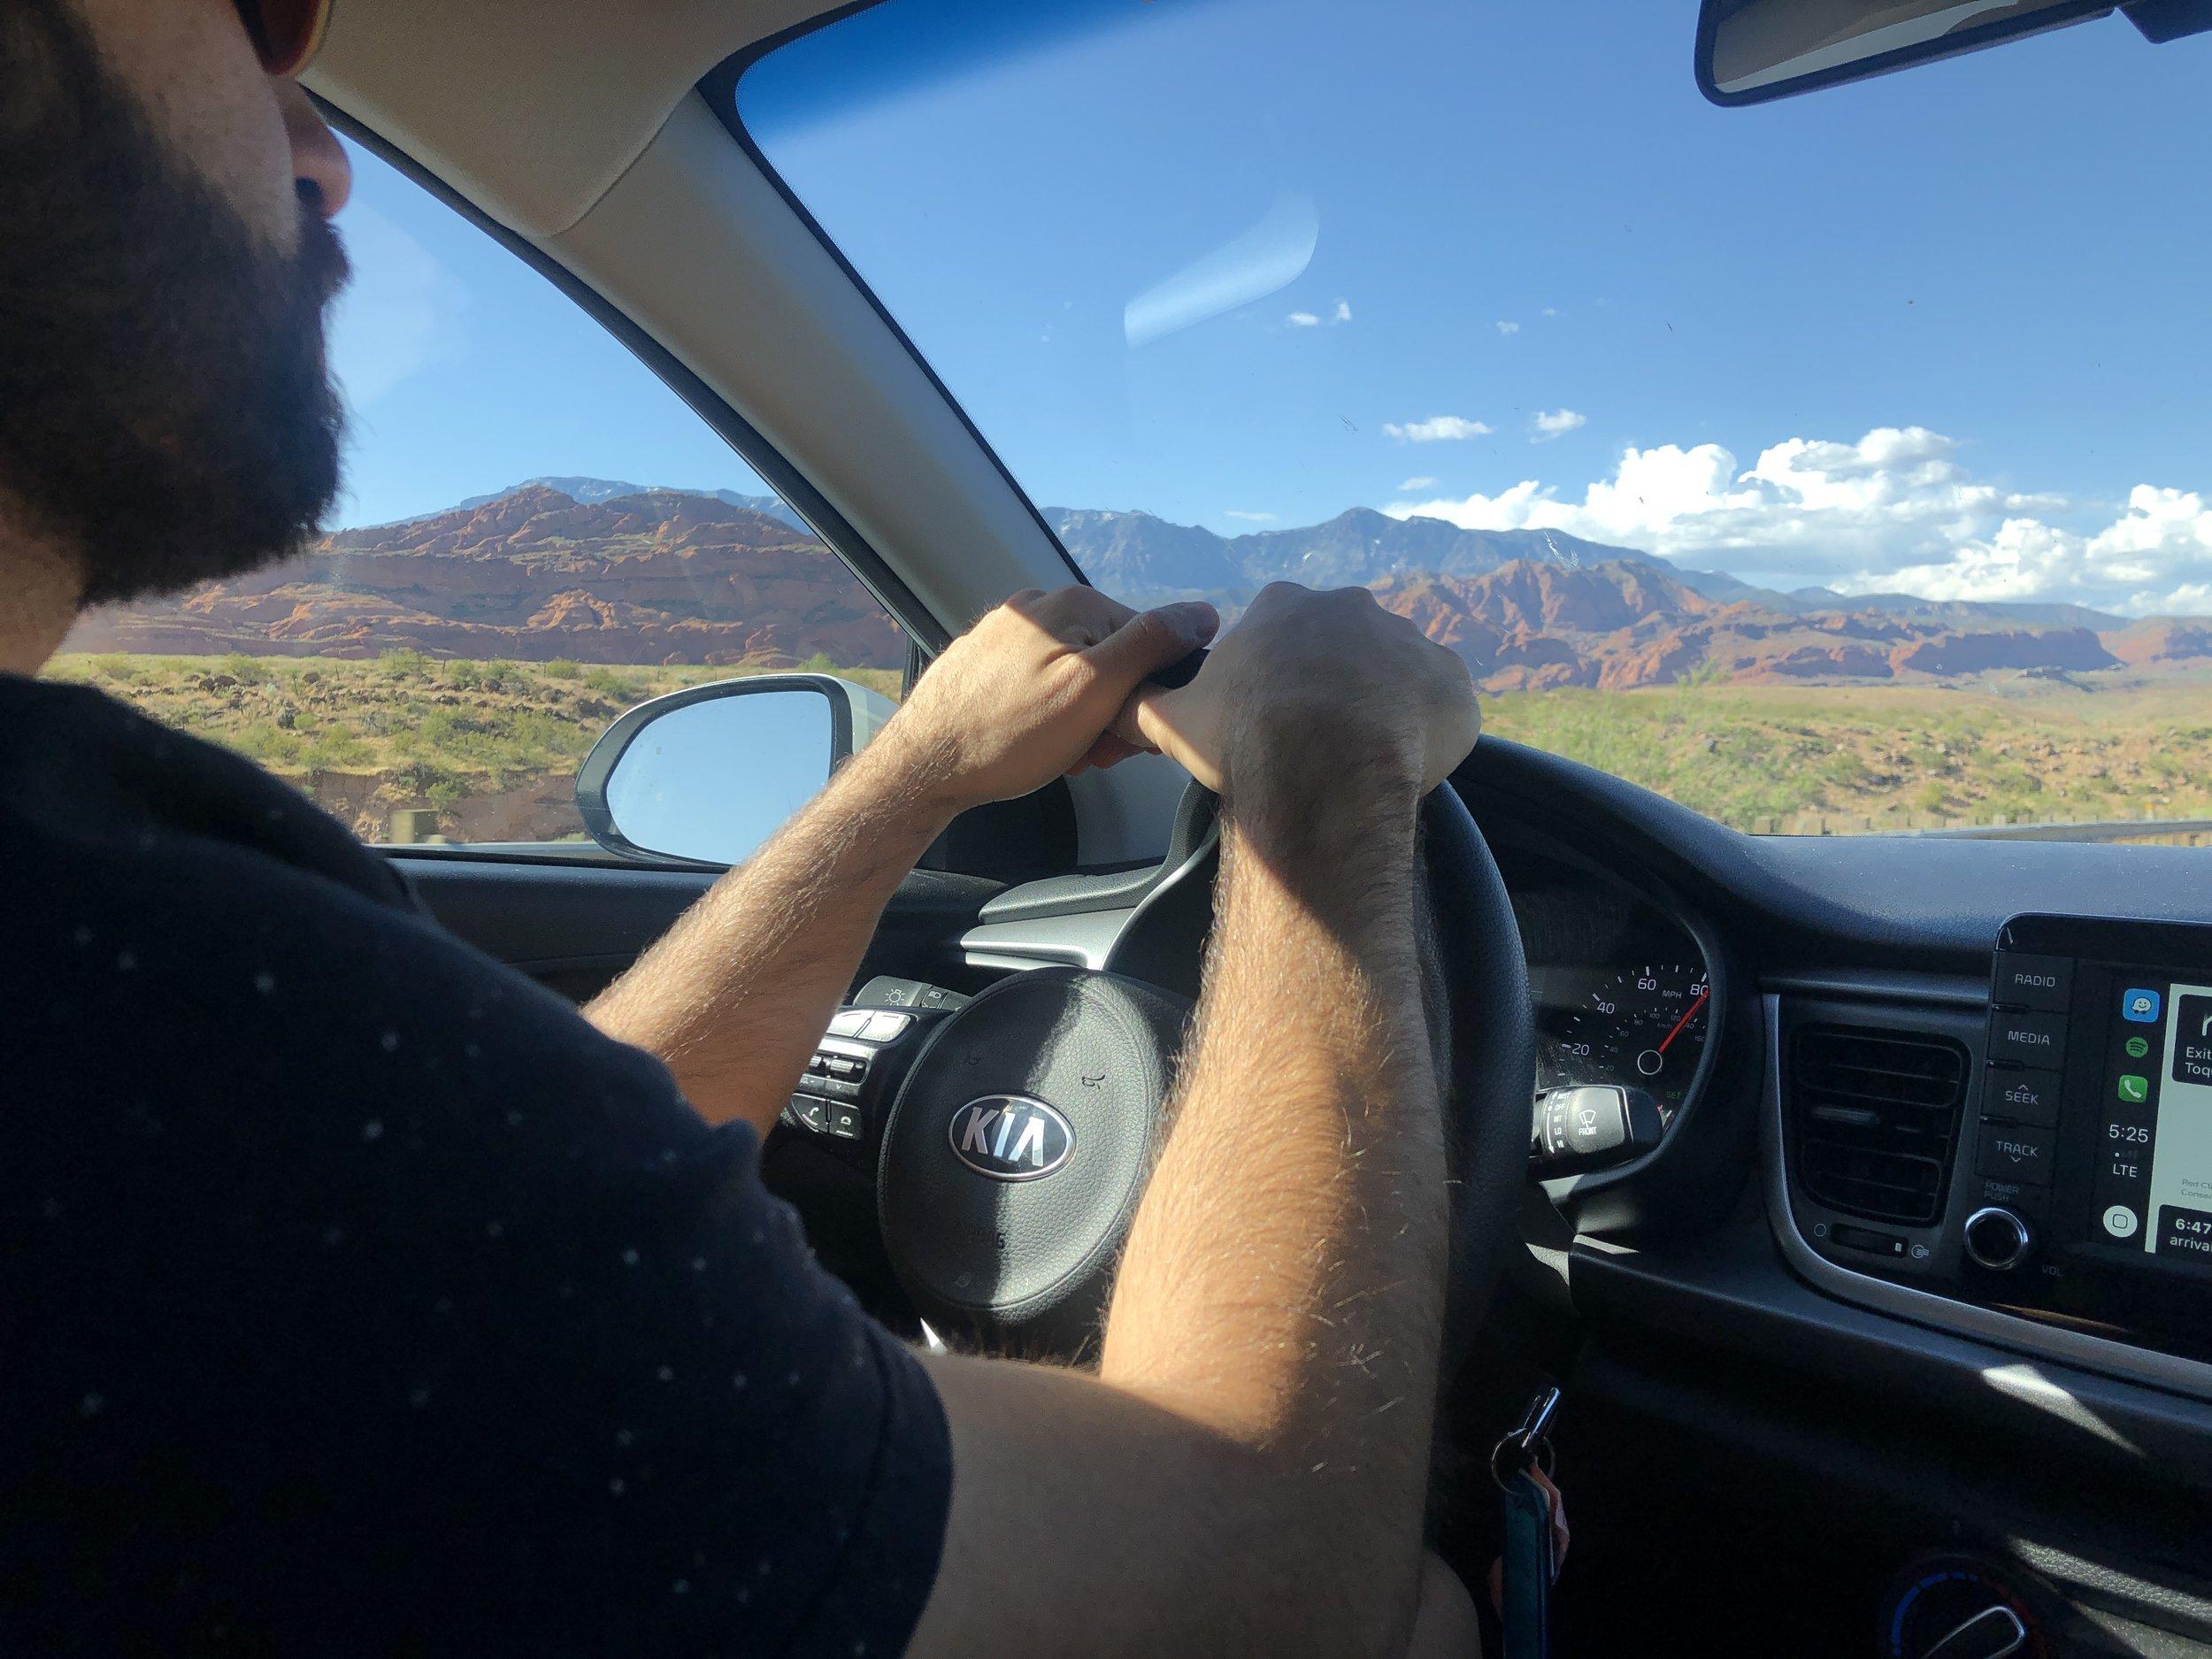 utah-vegas-road-trip-driving-out-of-office-adventure